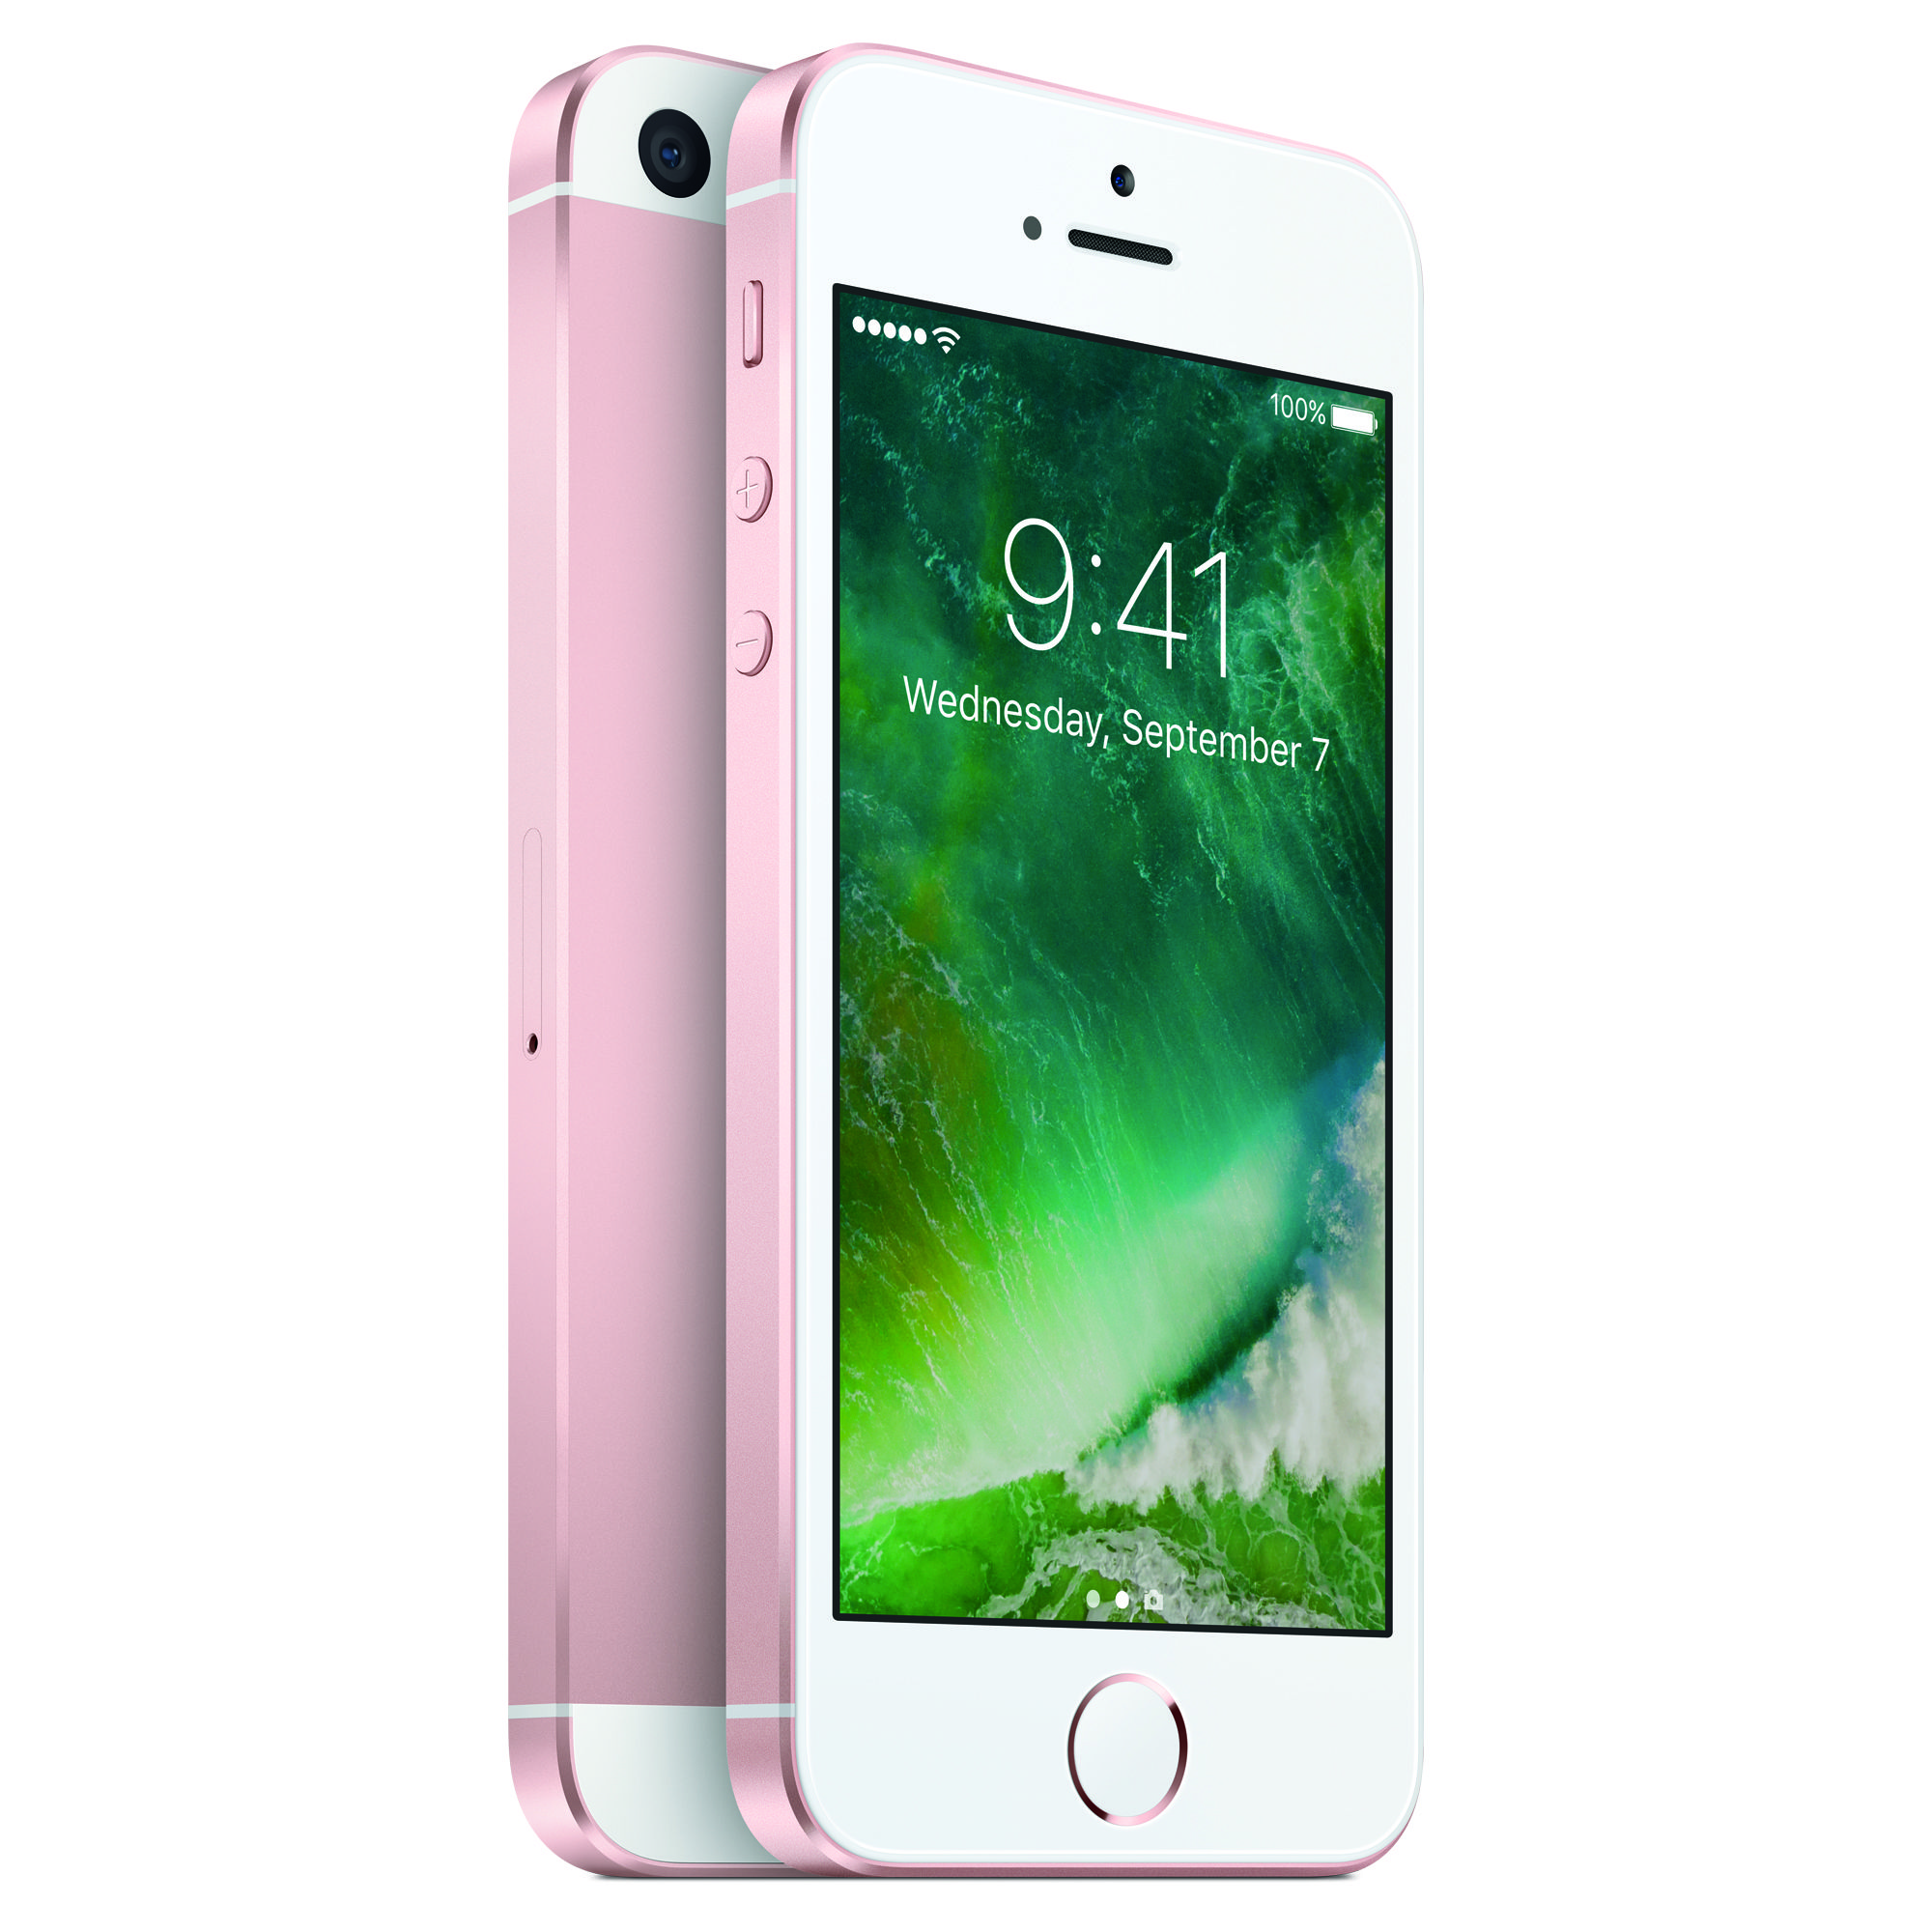 Cell Phones Apple Iphone 6s Iphone Apple Iphone 6s Plus